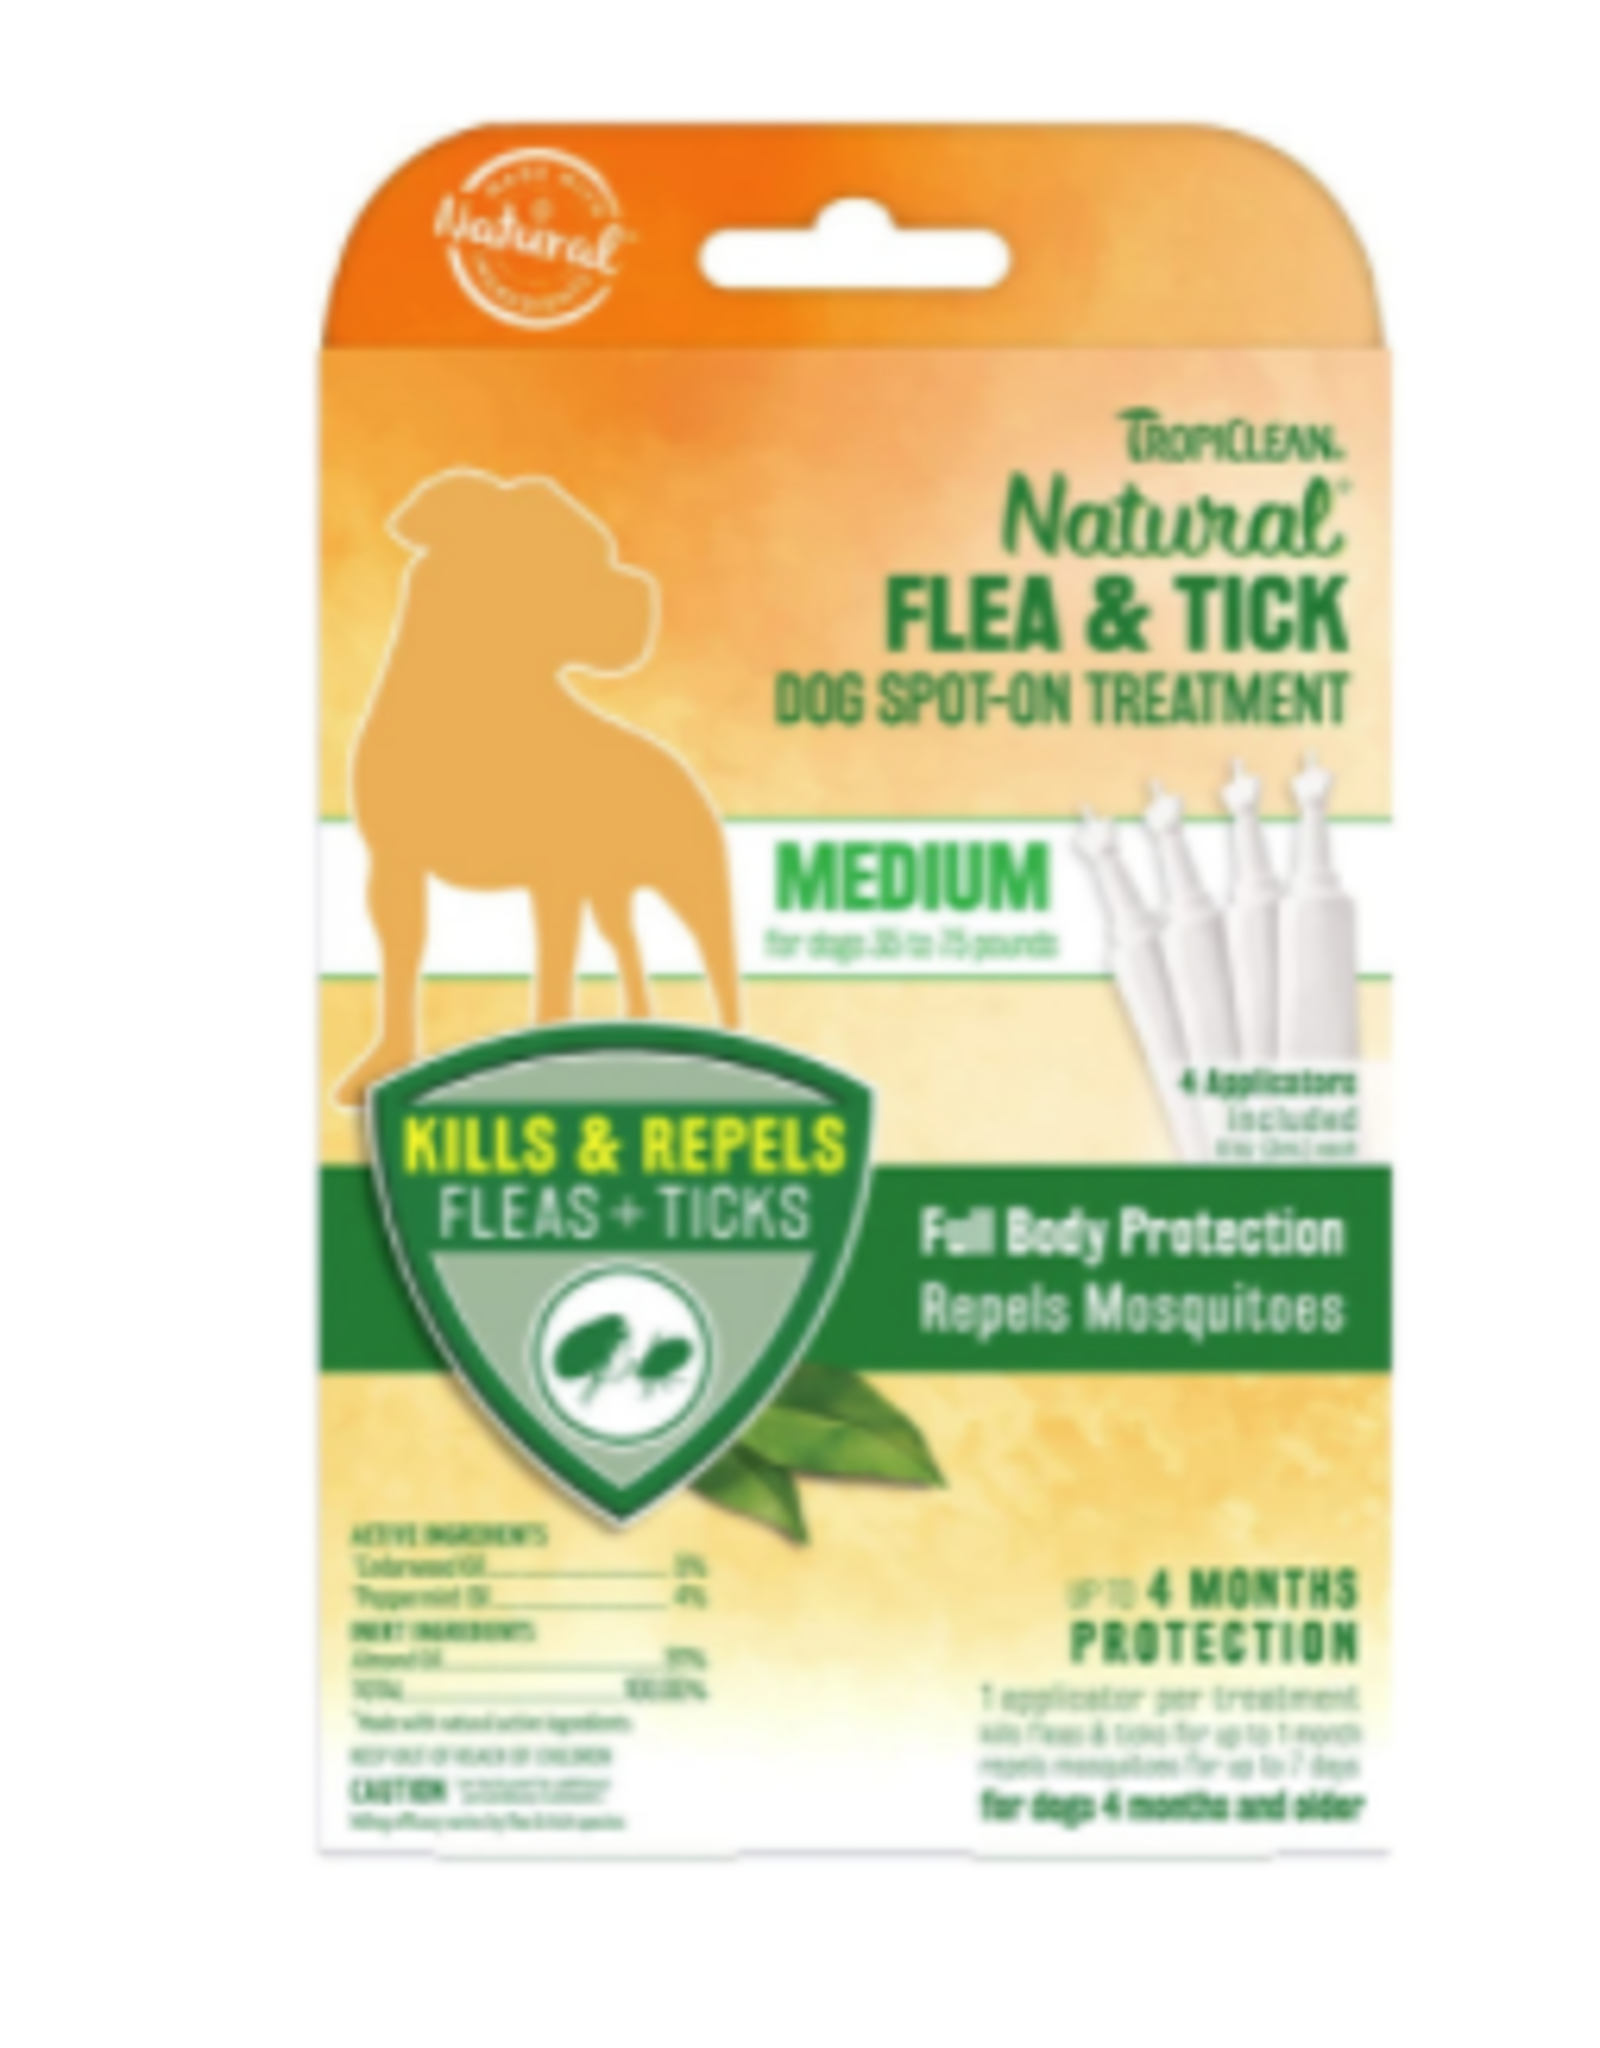 TropiClean Natural Flea & Tick Spot On Treatment for Dogs 0.4 fl oz - 4 Count - Medium